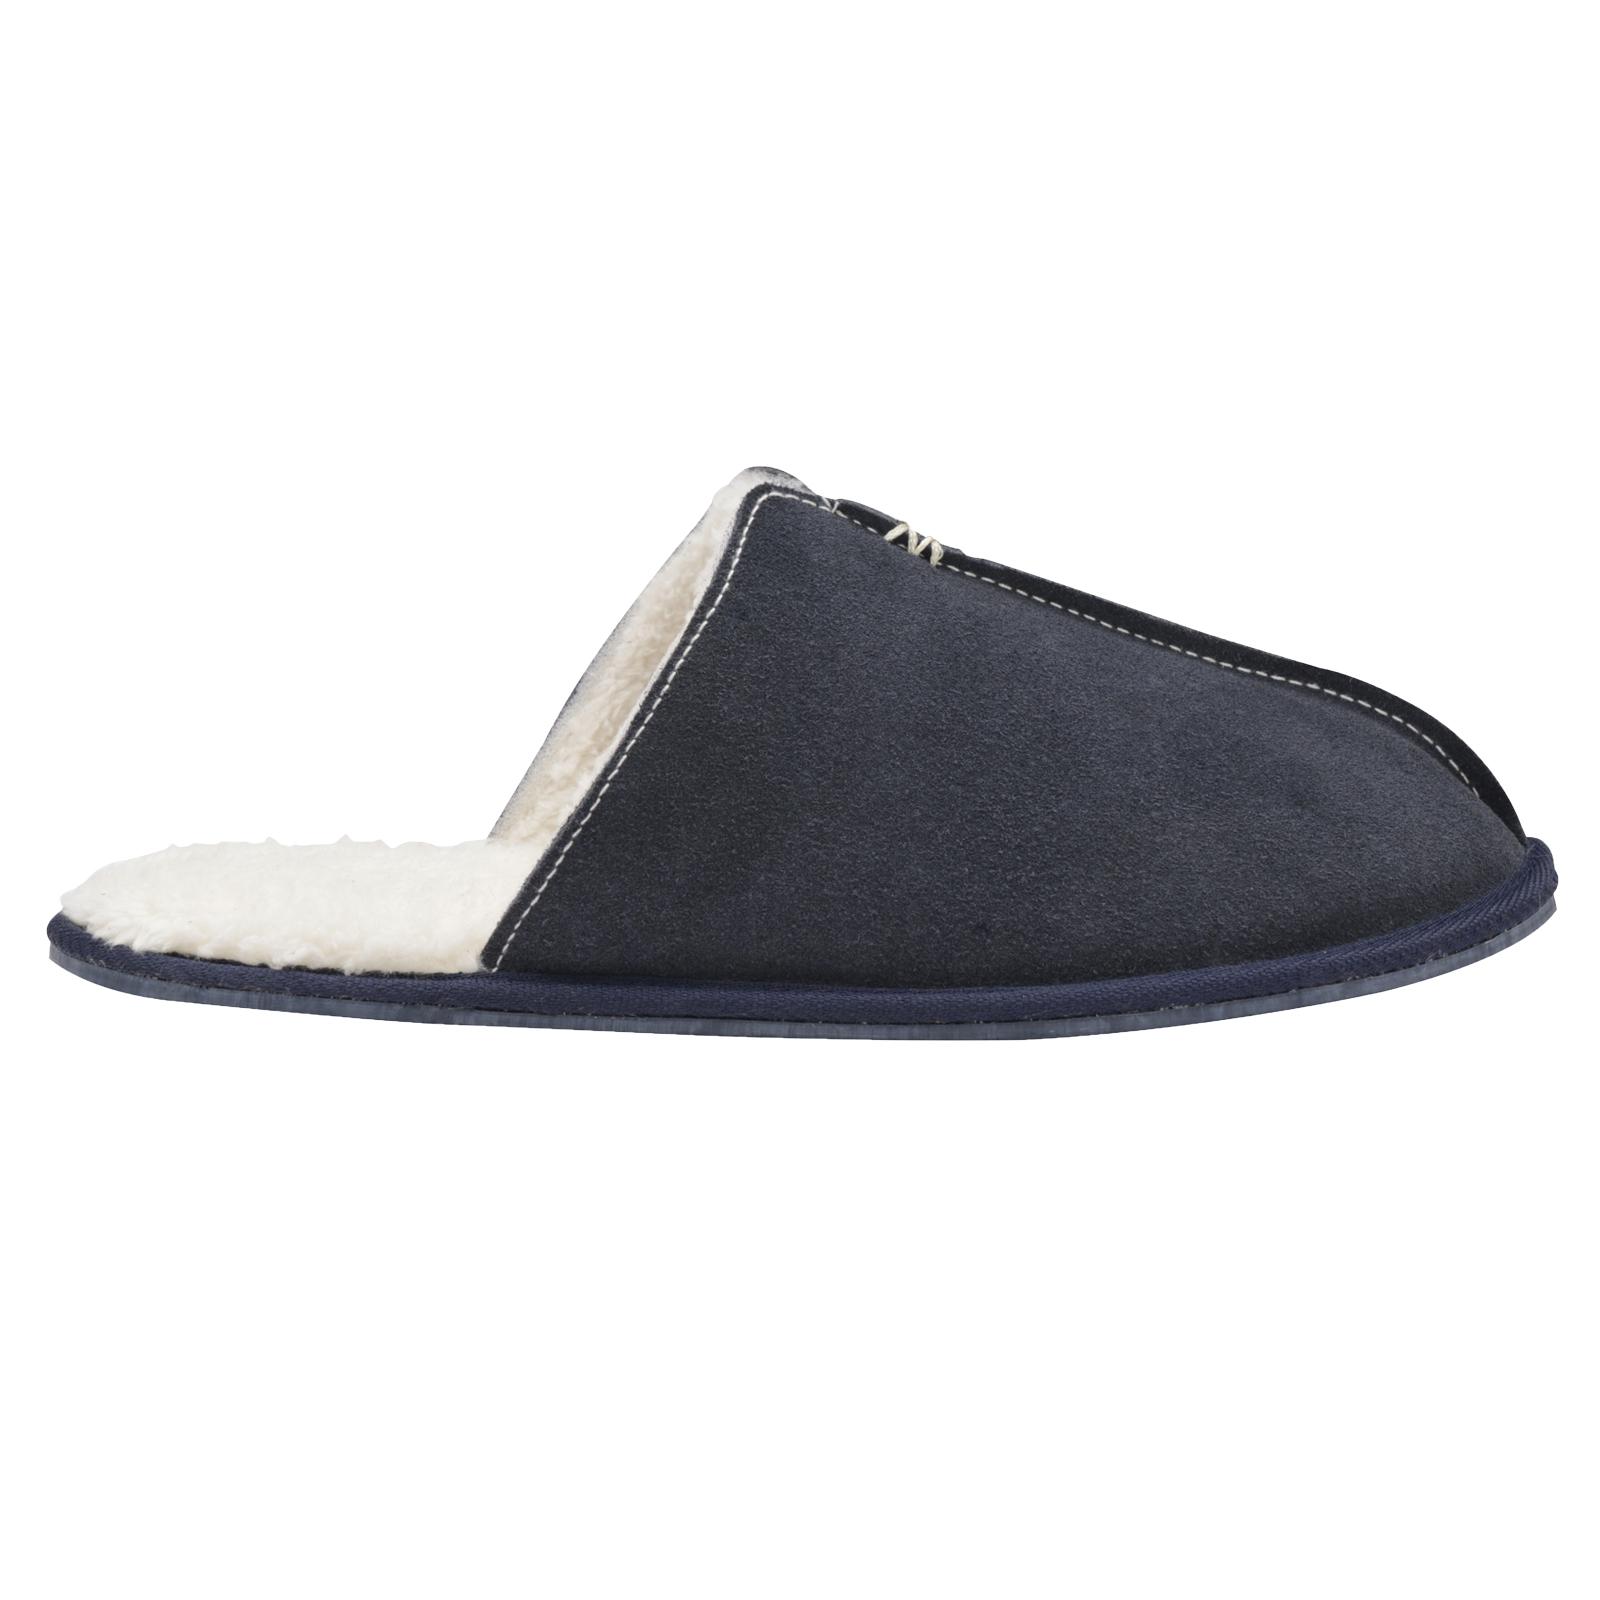 Mens Dunlop Brandon Or Amadieu Slipper Fleece Lined Luxury Faux Suede Mule Shoes